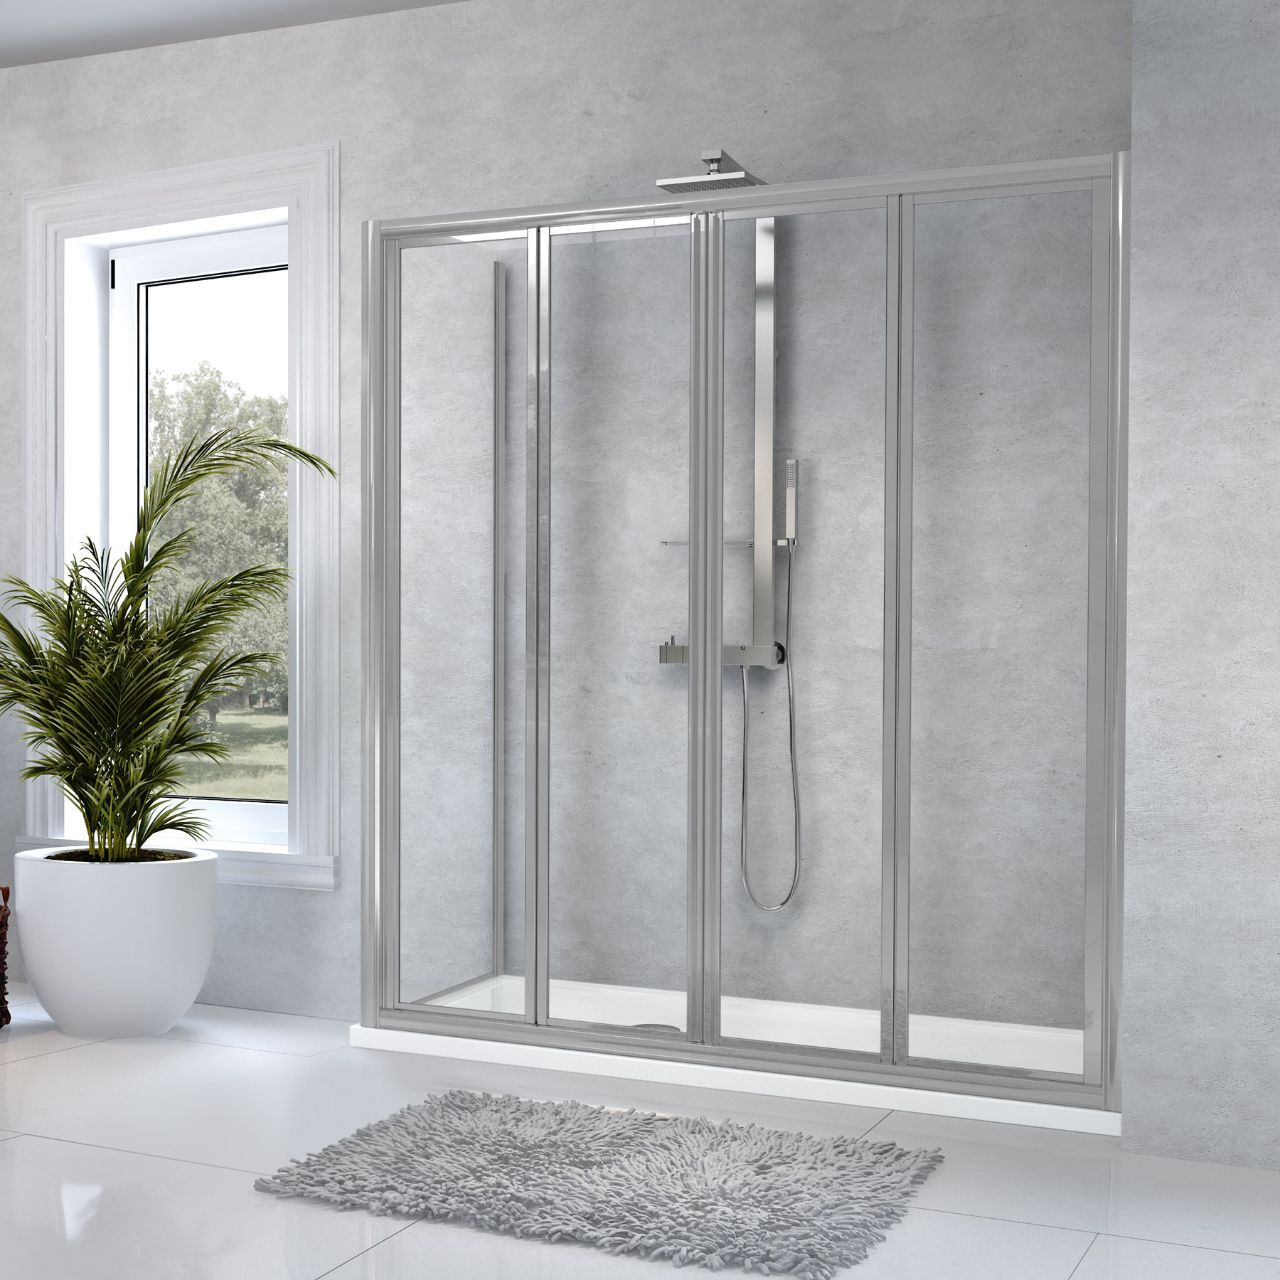 box doccia star 2s f novellini. Black Bedroom Furniture Sets. Home Design Ideas